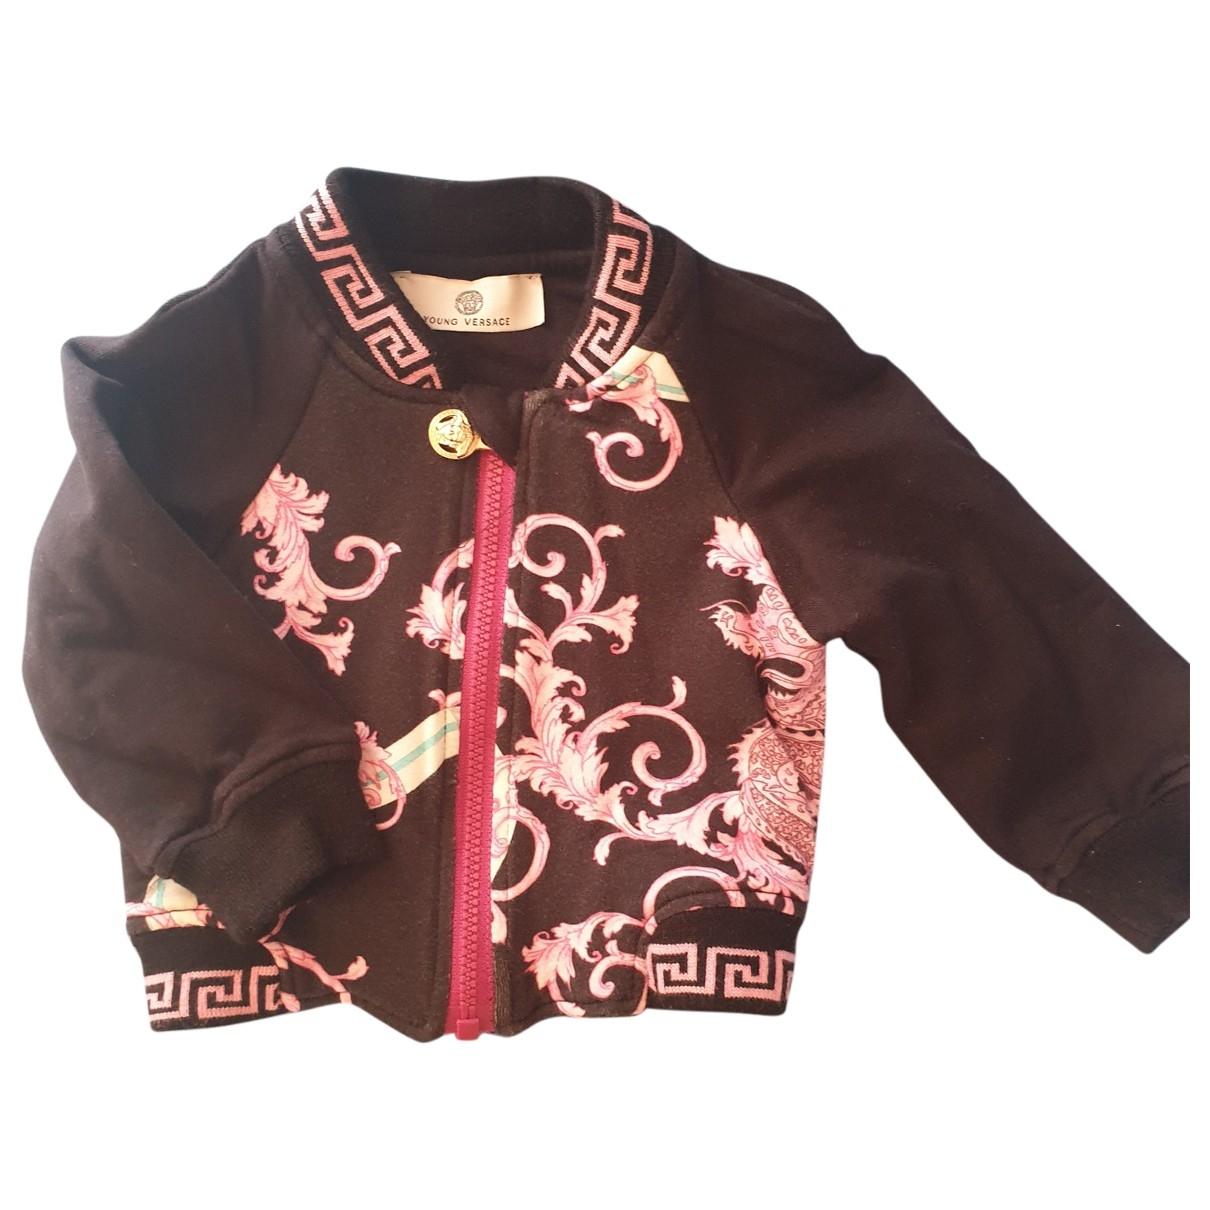 Versace \N Black Cotton jacket & coat for Kids 6 months - up to 67cm FR